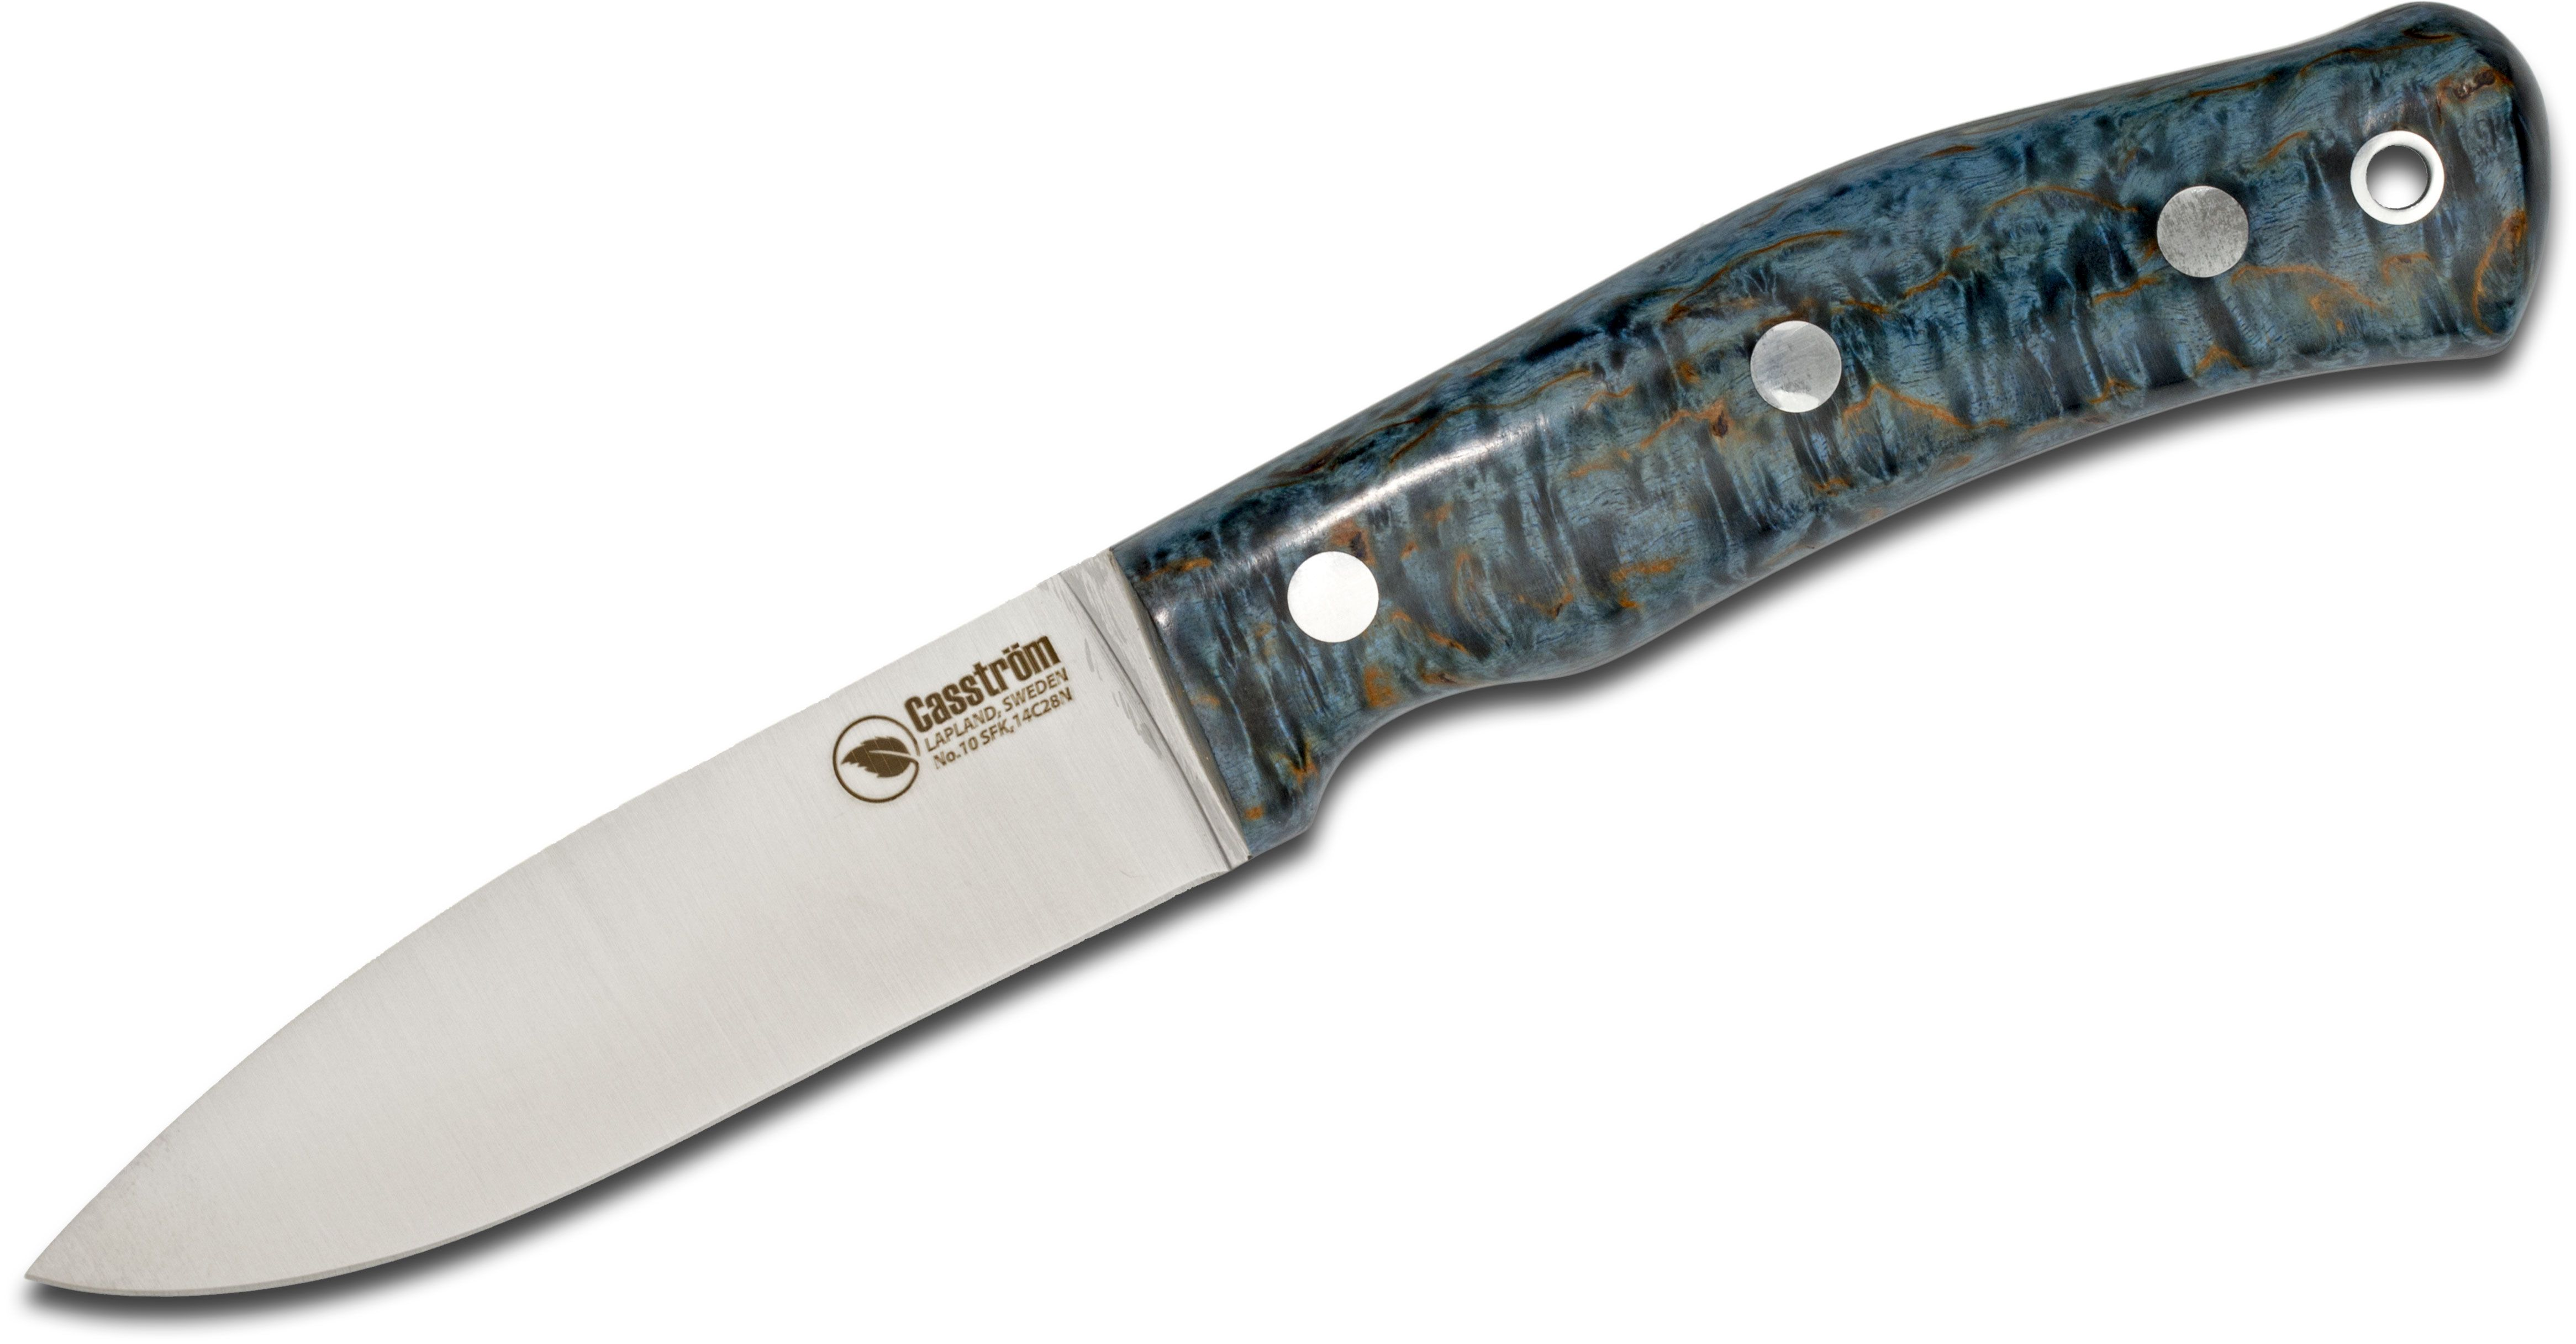 Casstrom Sweden No. 10 SFK Fixed 3.875 inch 14C28N Full Flat Ground Blade, Blue Curly Birch Wood Handles, Black Leather Sheath